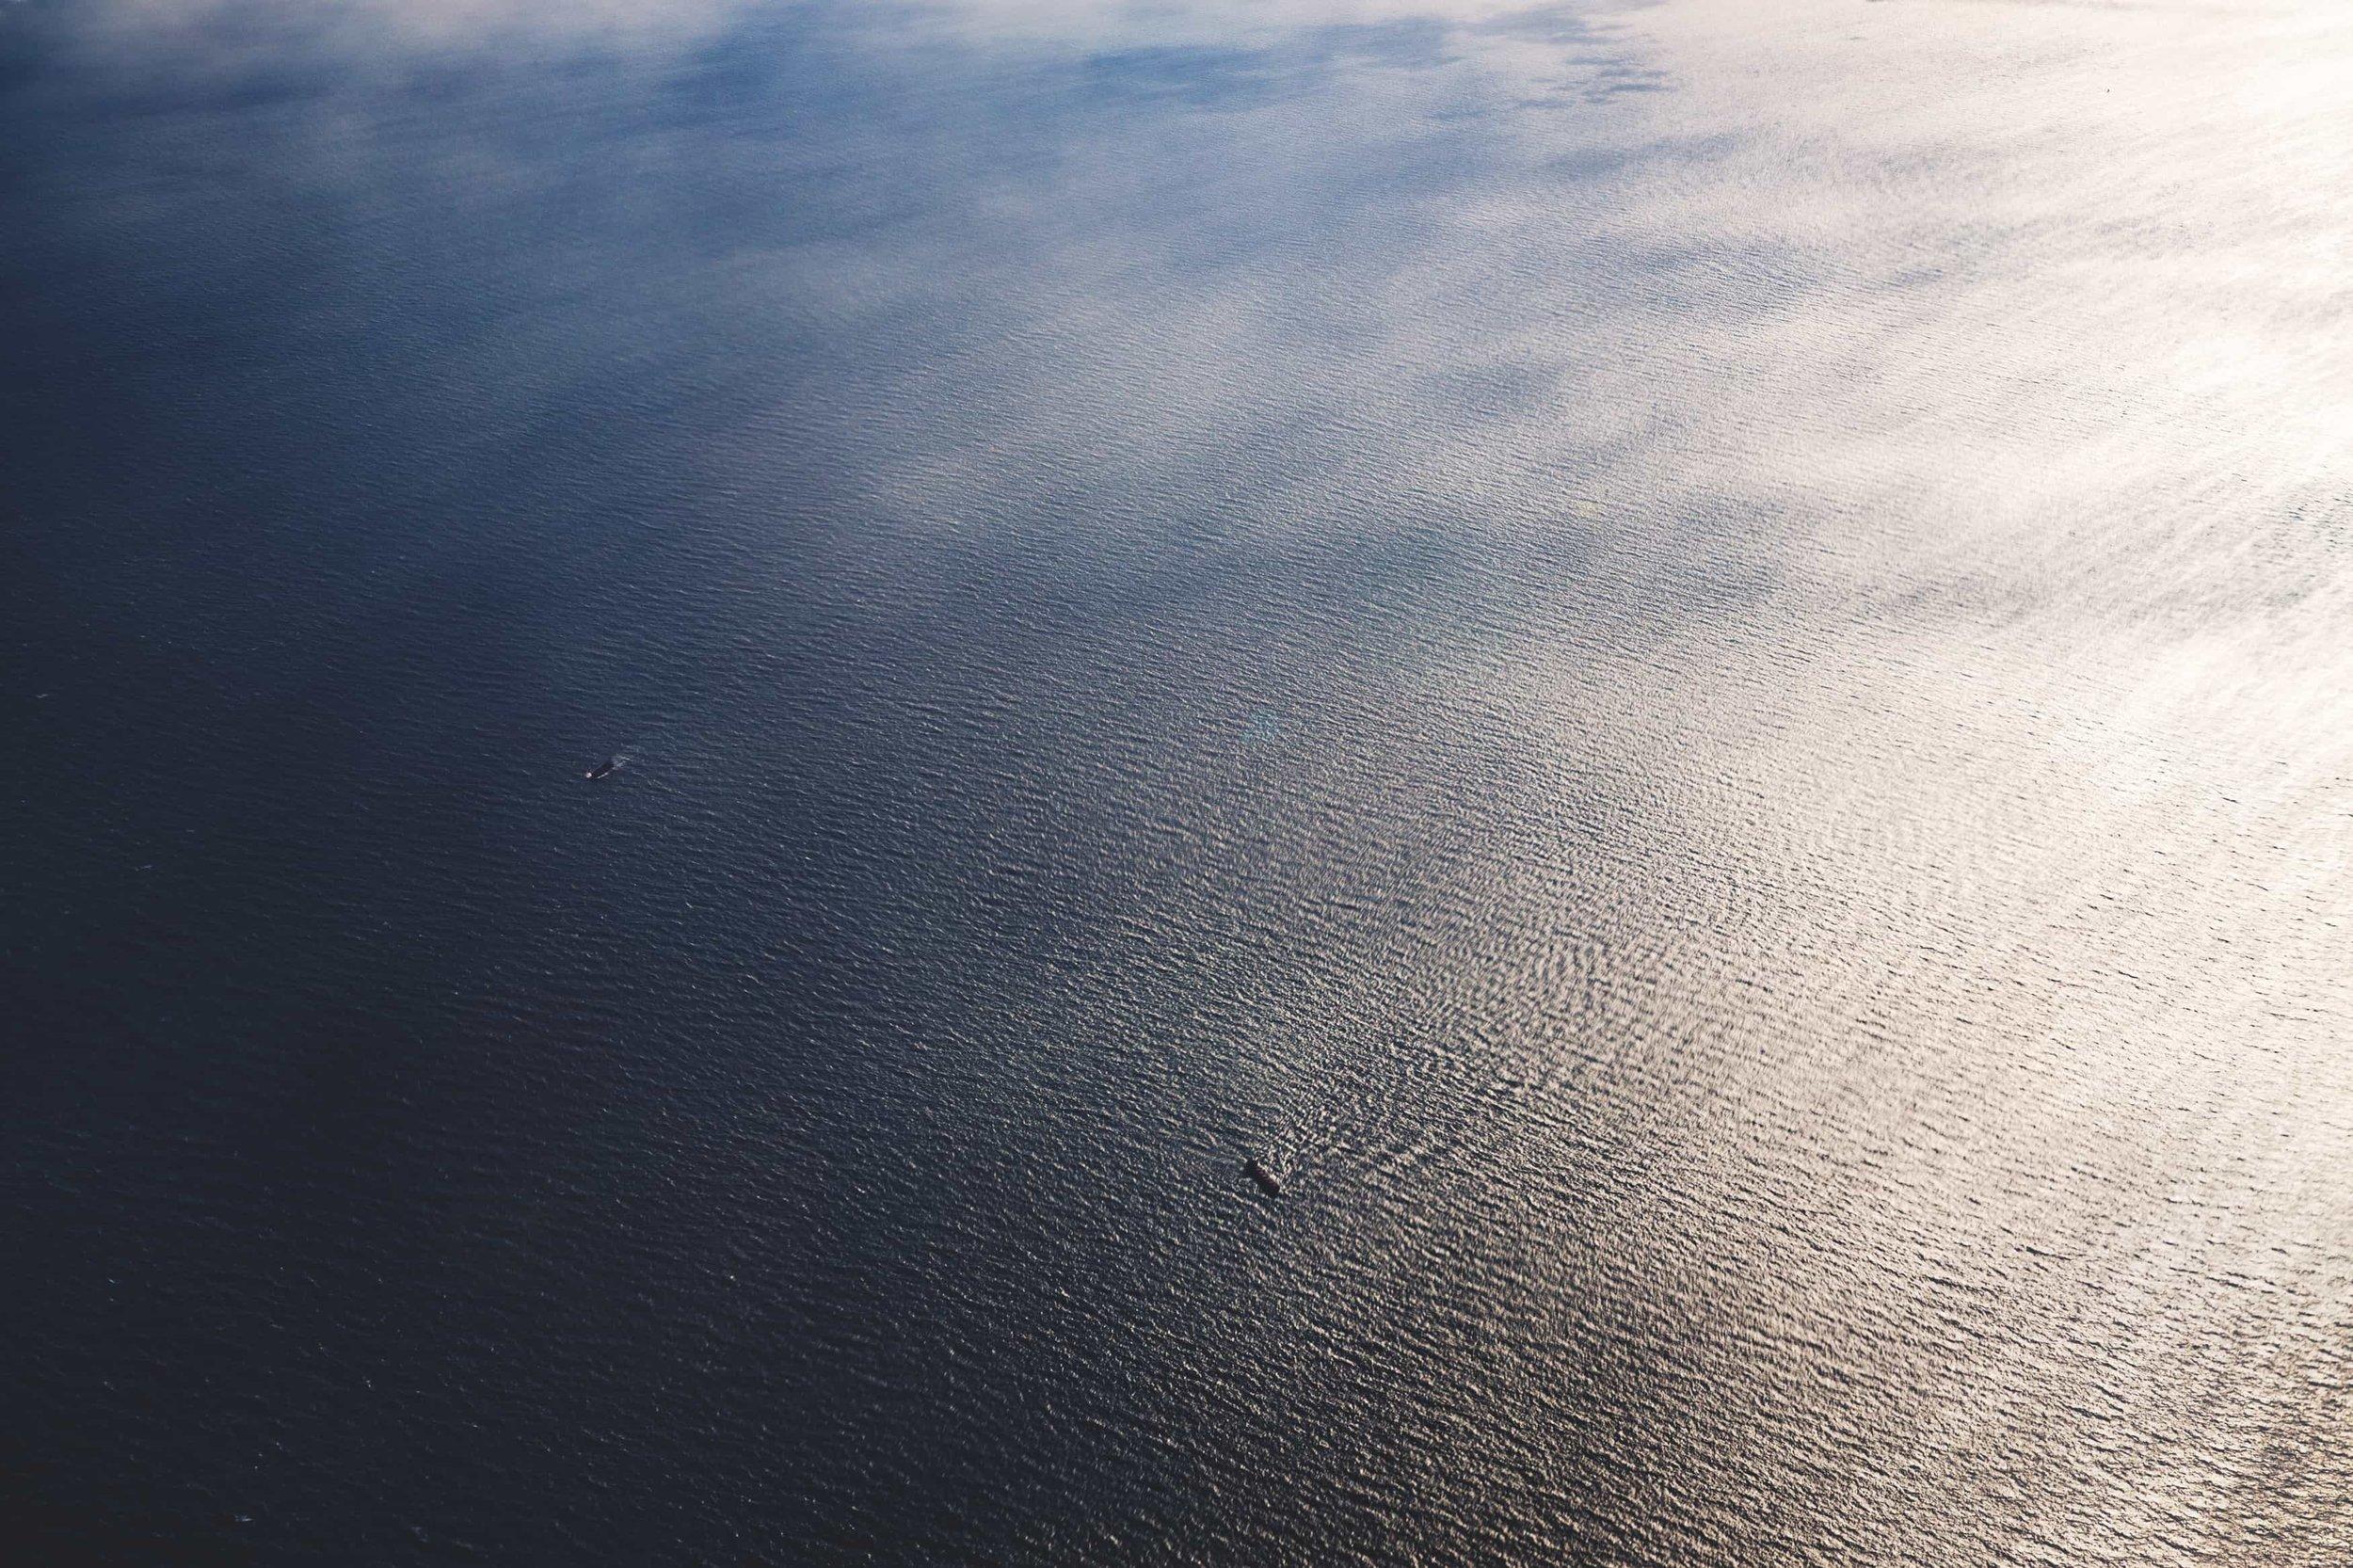 aerial_landscape_photography_fabio_burrelli_photographer_7.jpg